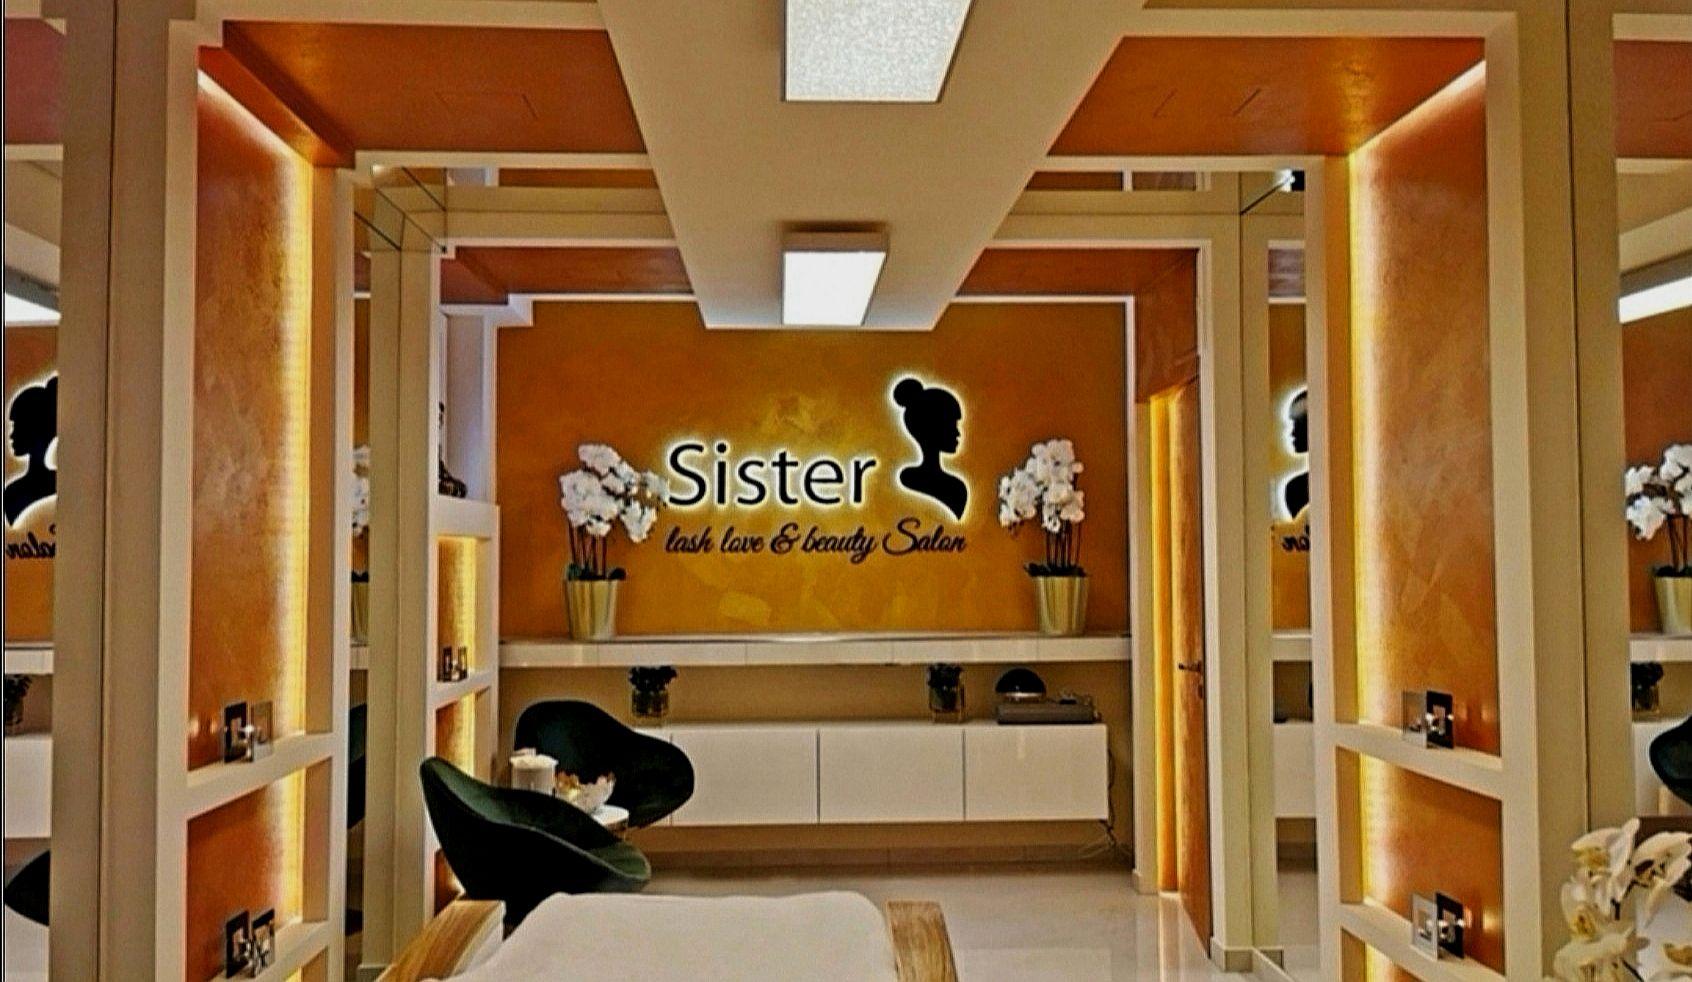 Sister lash love & beauty Salon